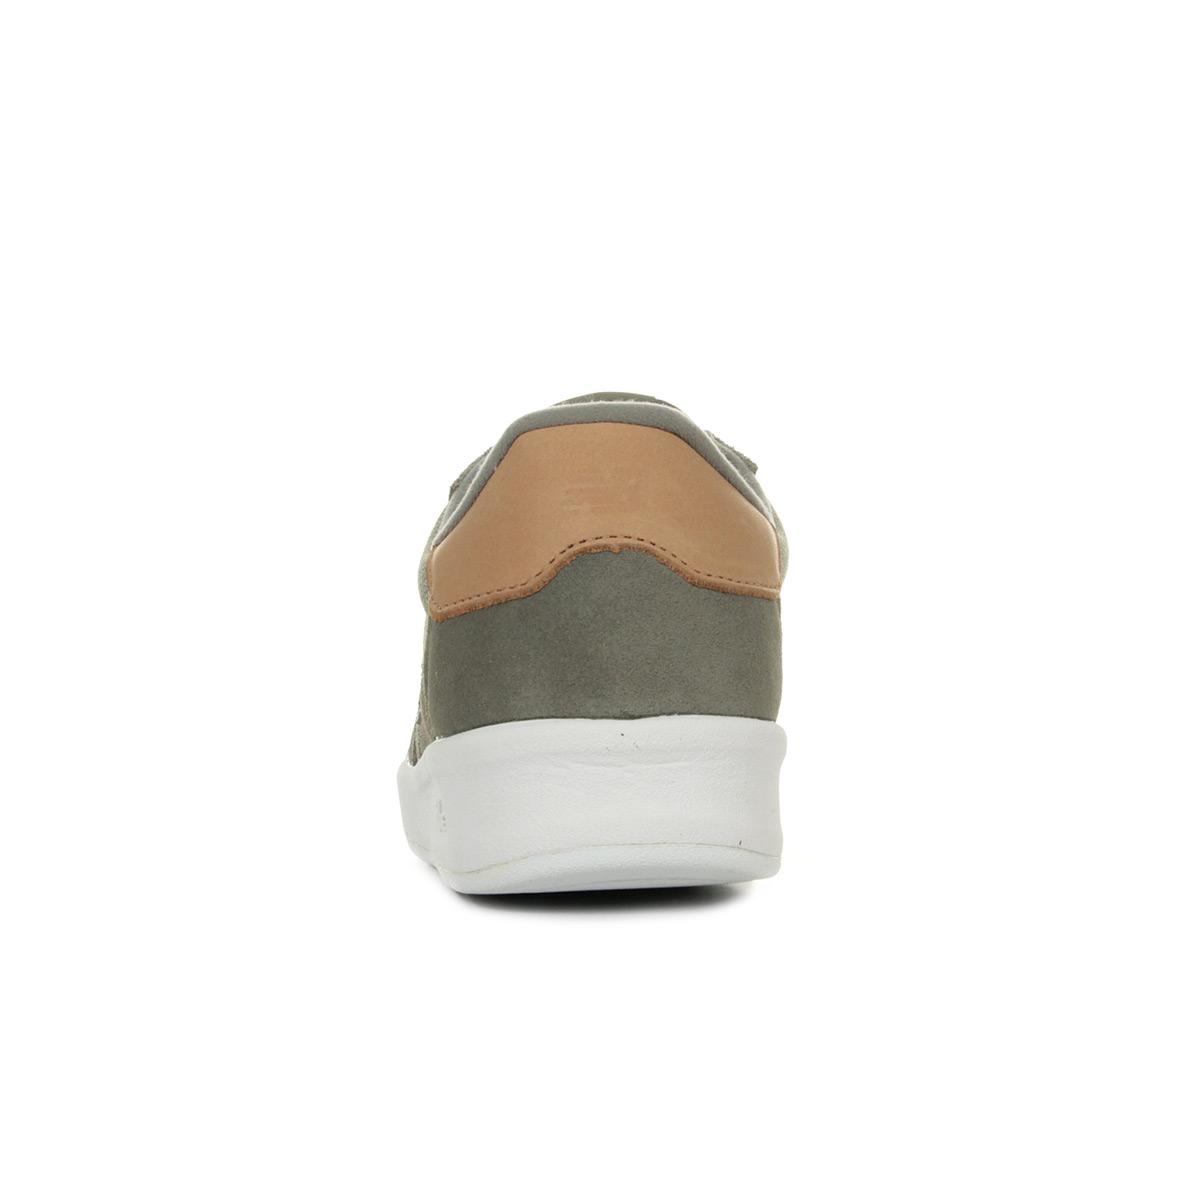 d5e6cf5c63b0 New Balance 300 Incense WRT300F0 Baskets mode femme Pas Cher Avec ...